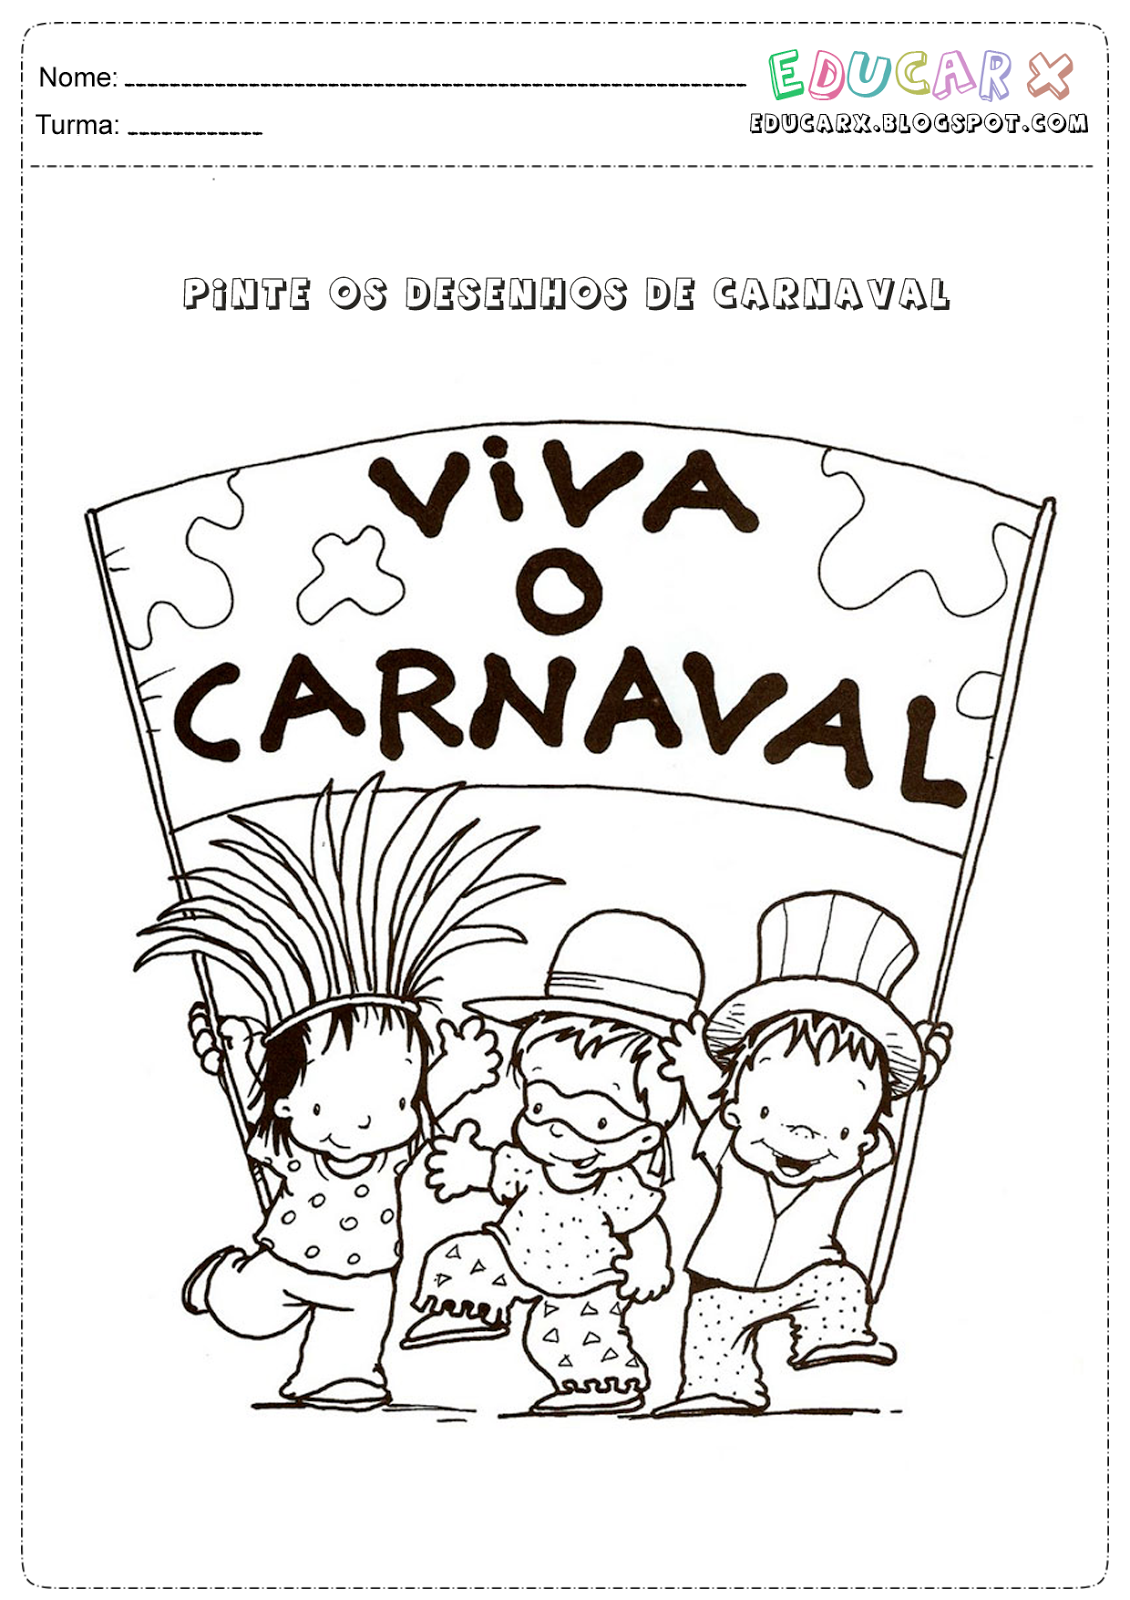 Desenhos de carnaval para colorir